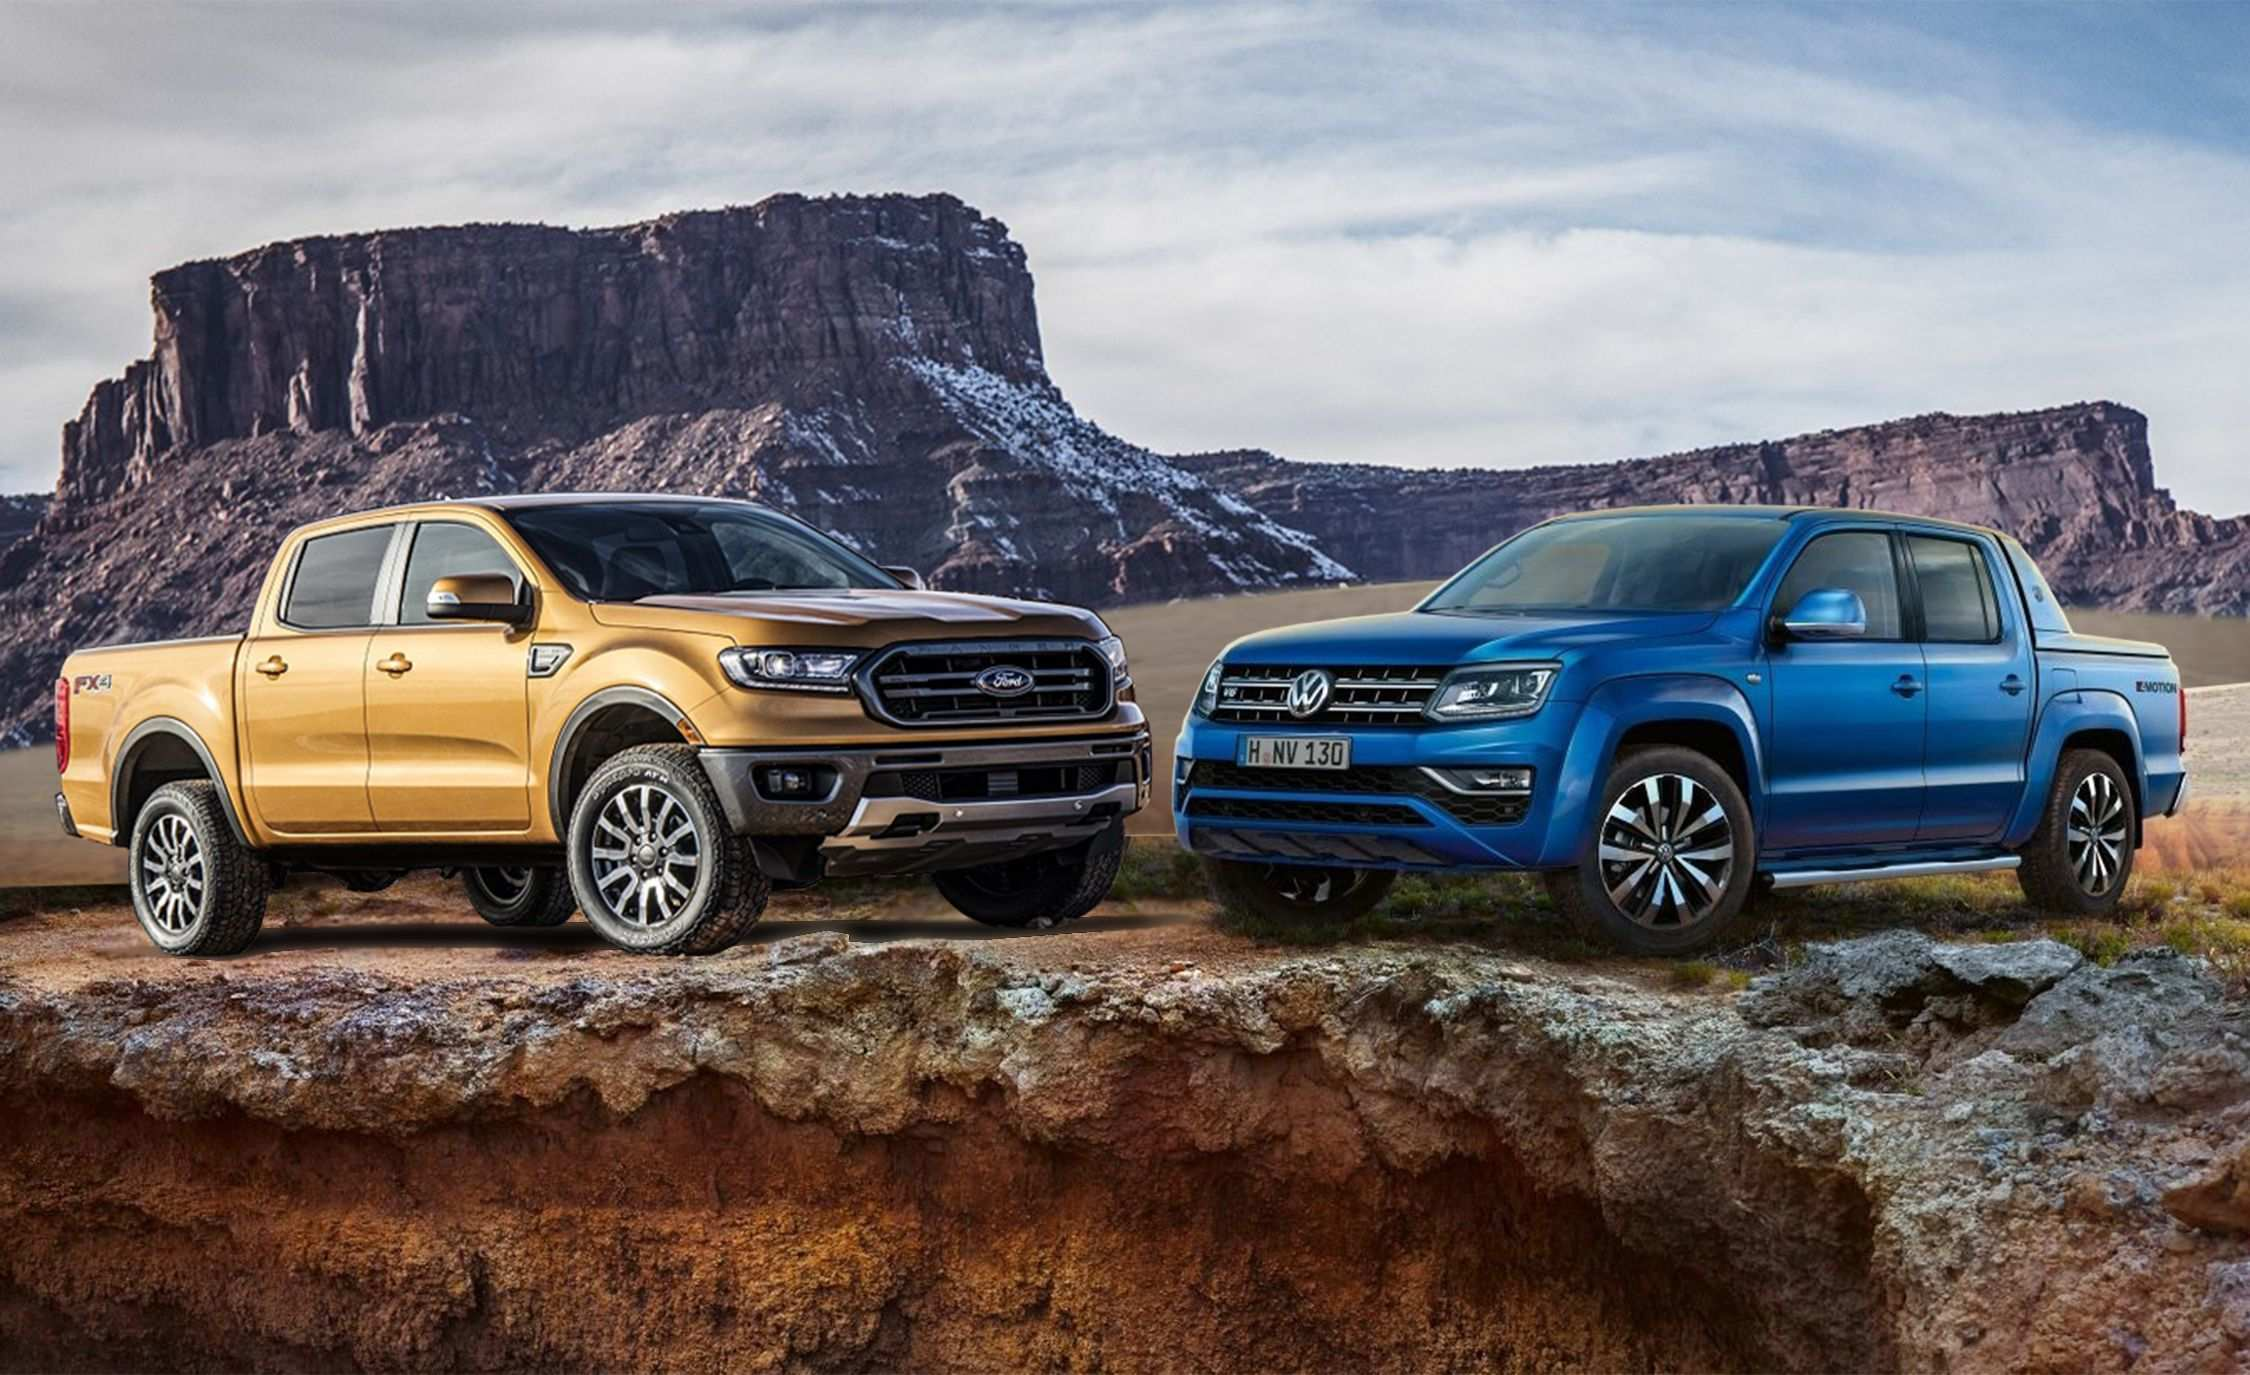 94 The 2020 Volkswagen Truck Price and Review with 2020 Volkswagen Truck